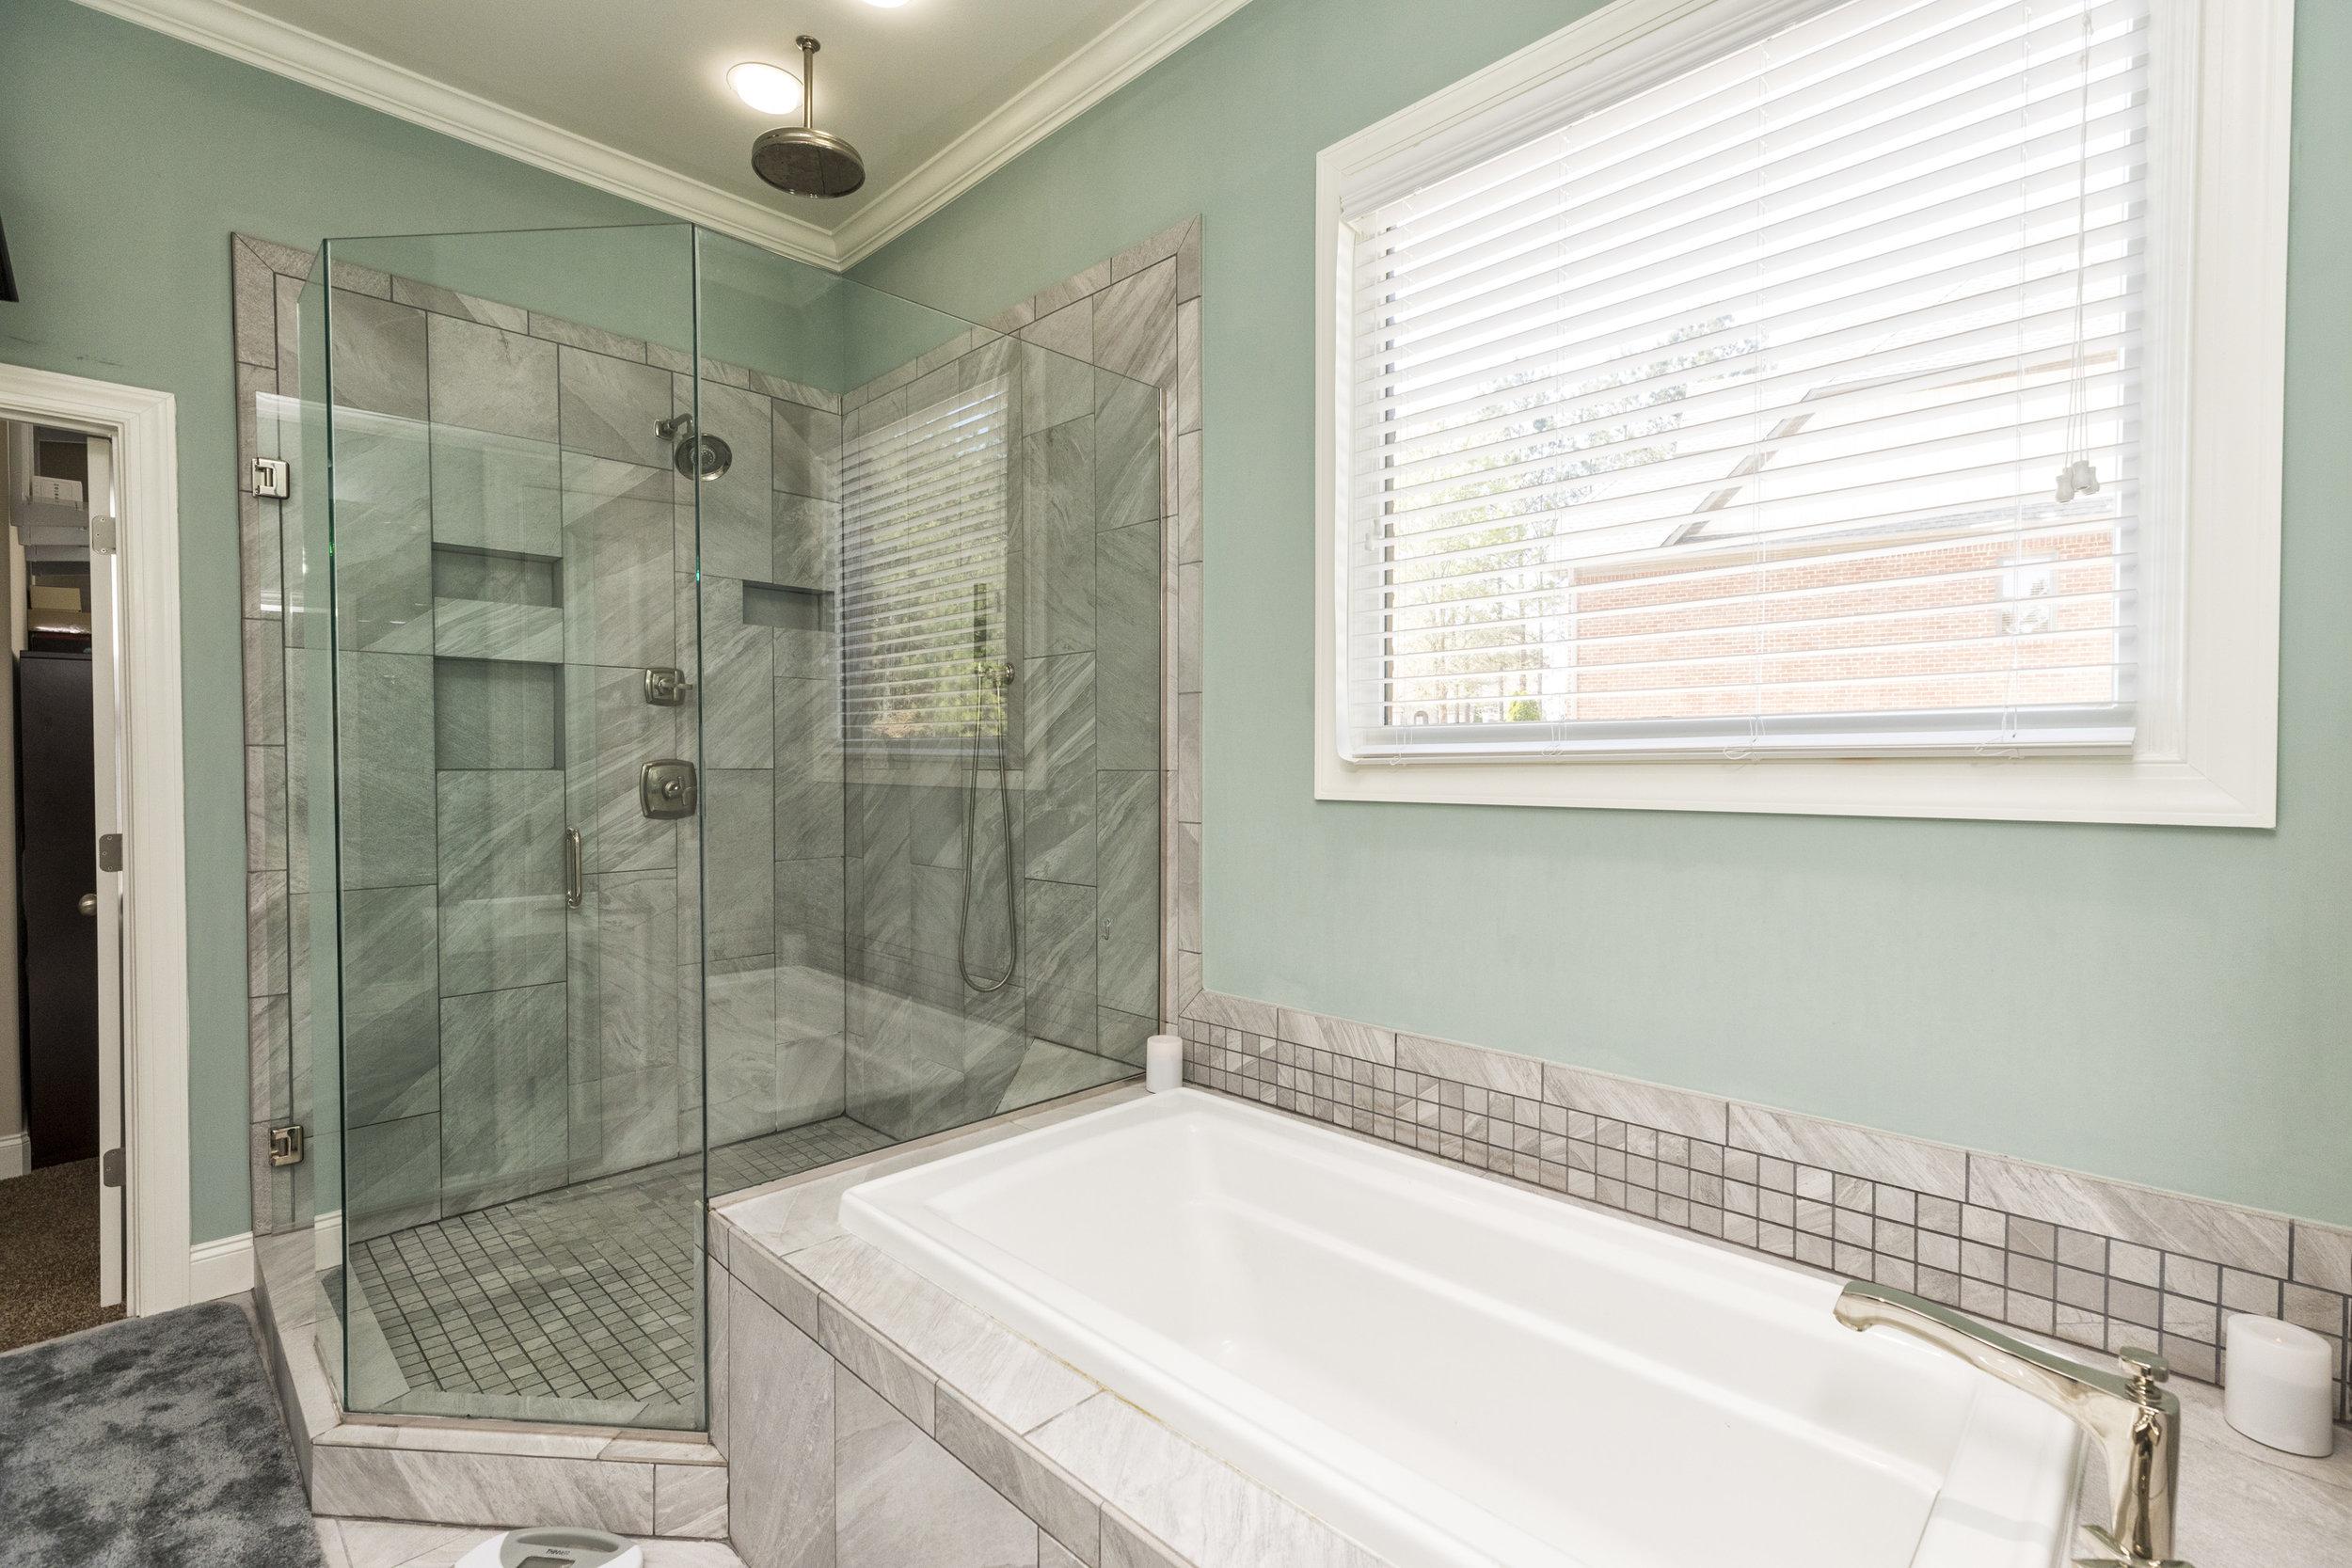 1009 master bath shower and tub.jpg